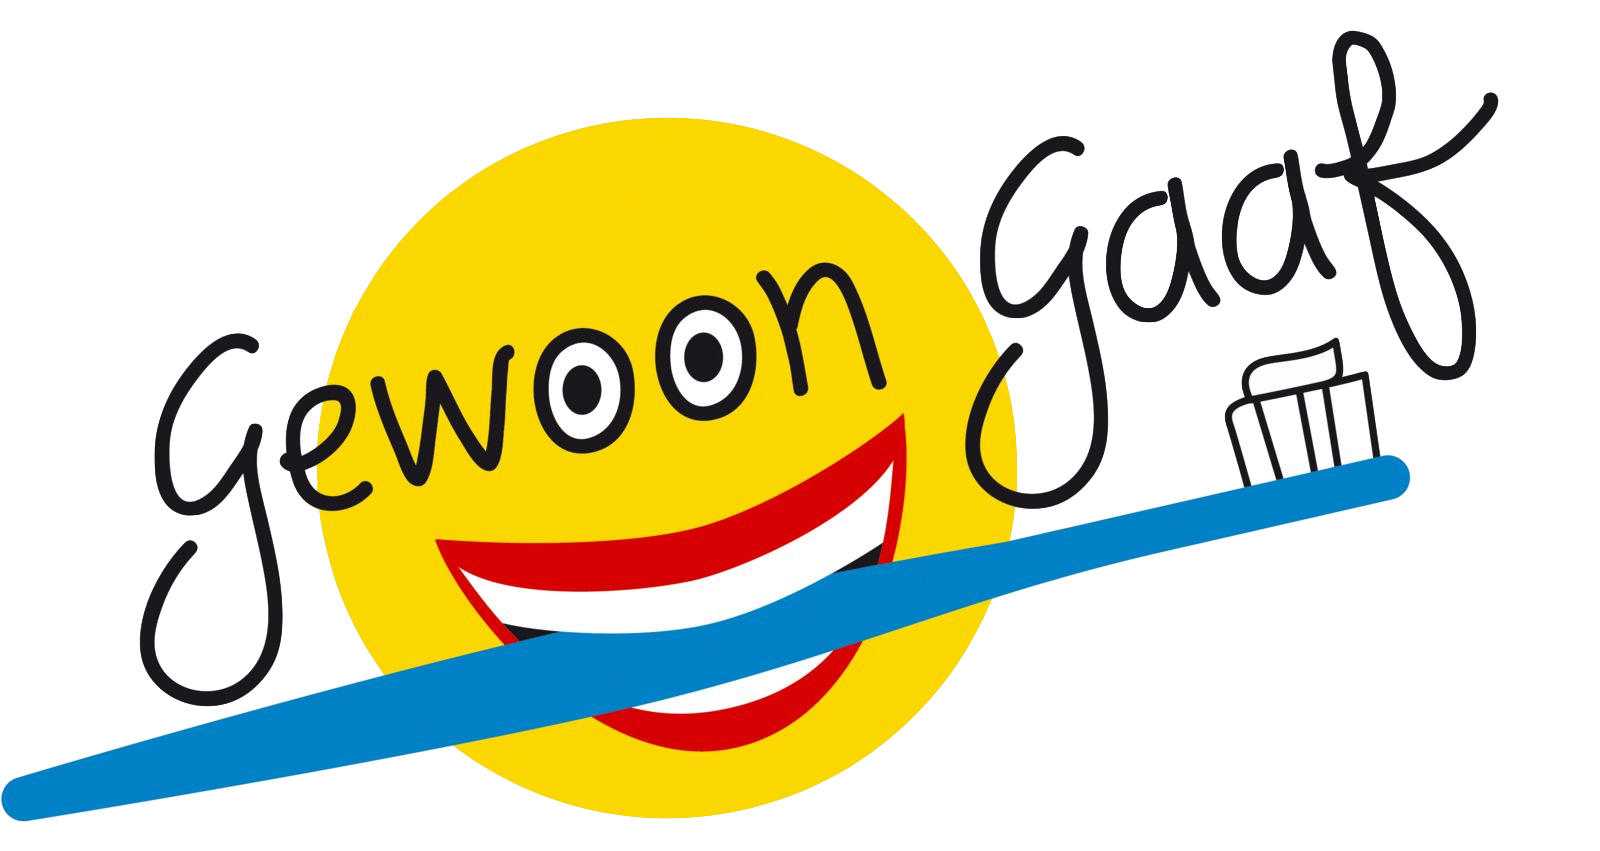 Gewoon Gaaf